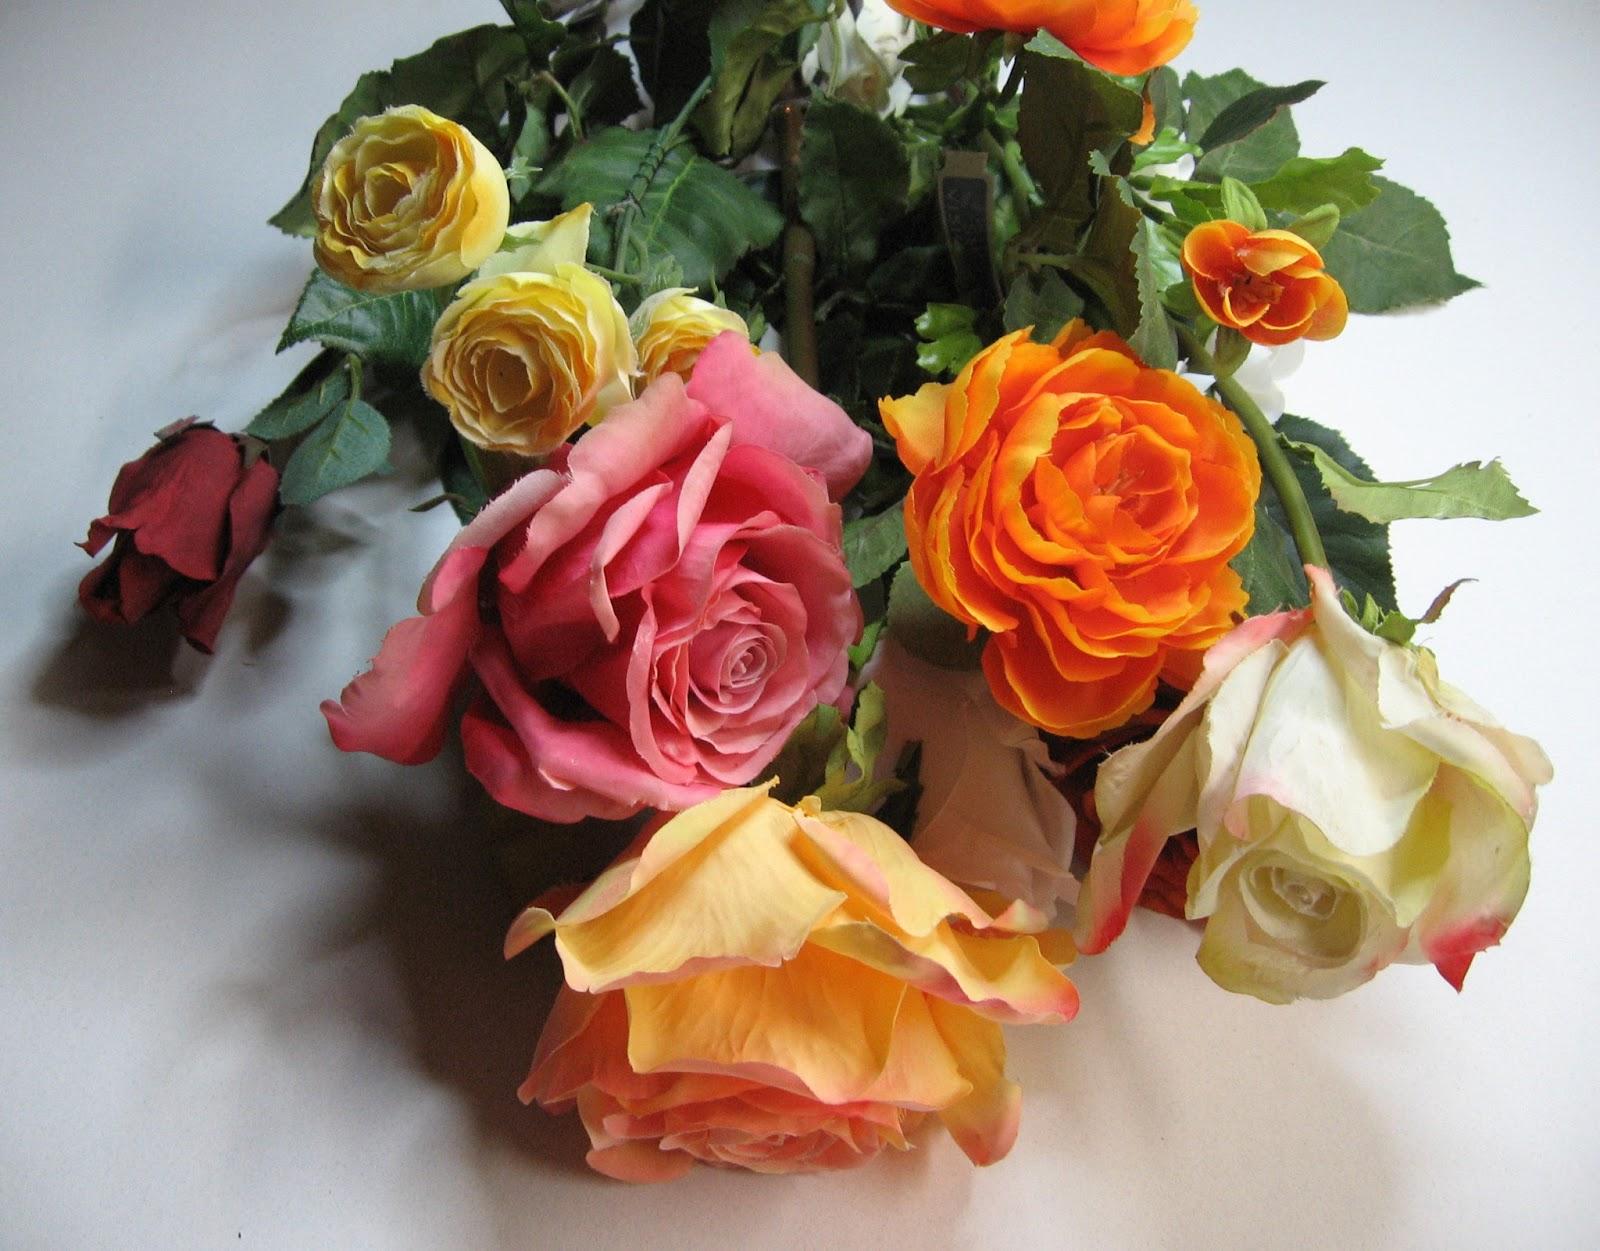 fausses fleurs artificial flowers. Black Bedroom Furniture Sets. Home Design Ideas